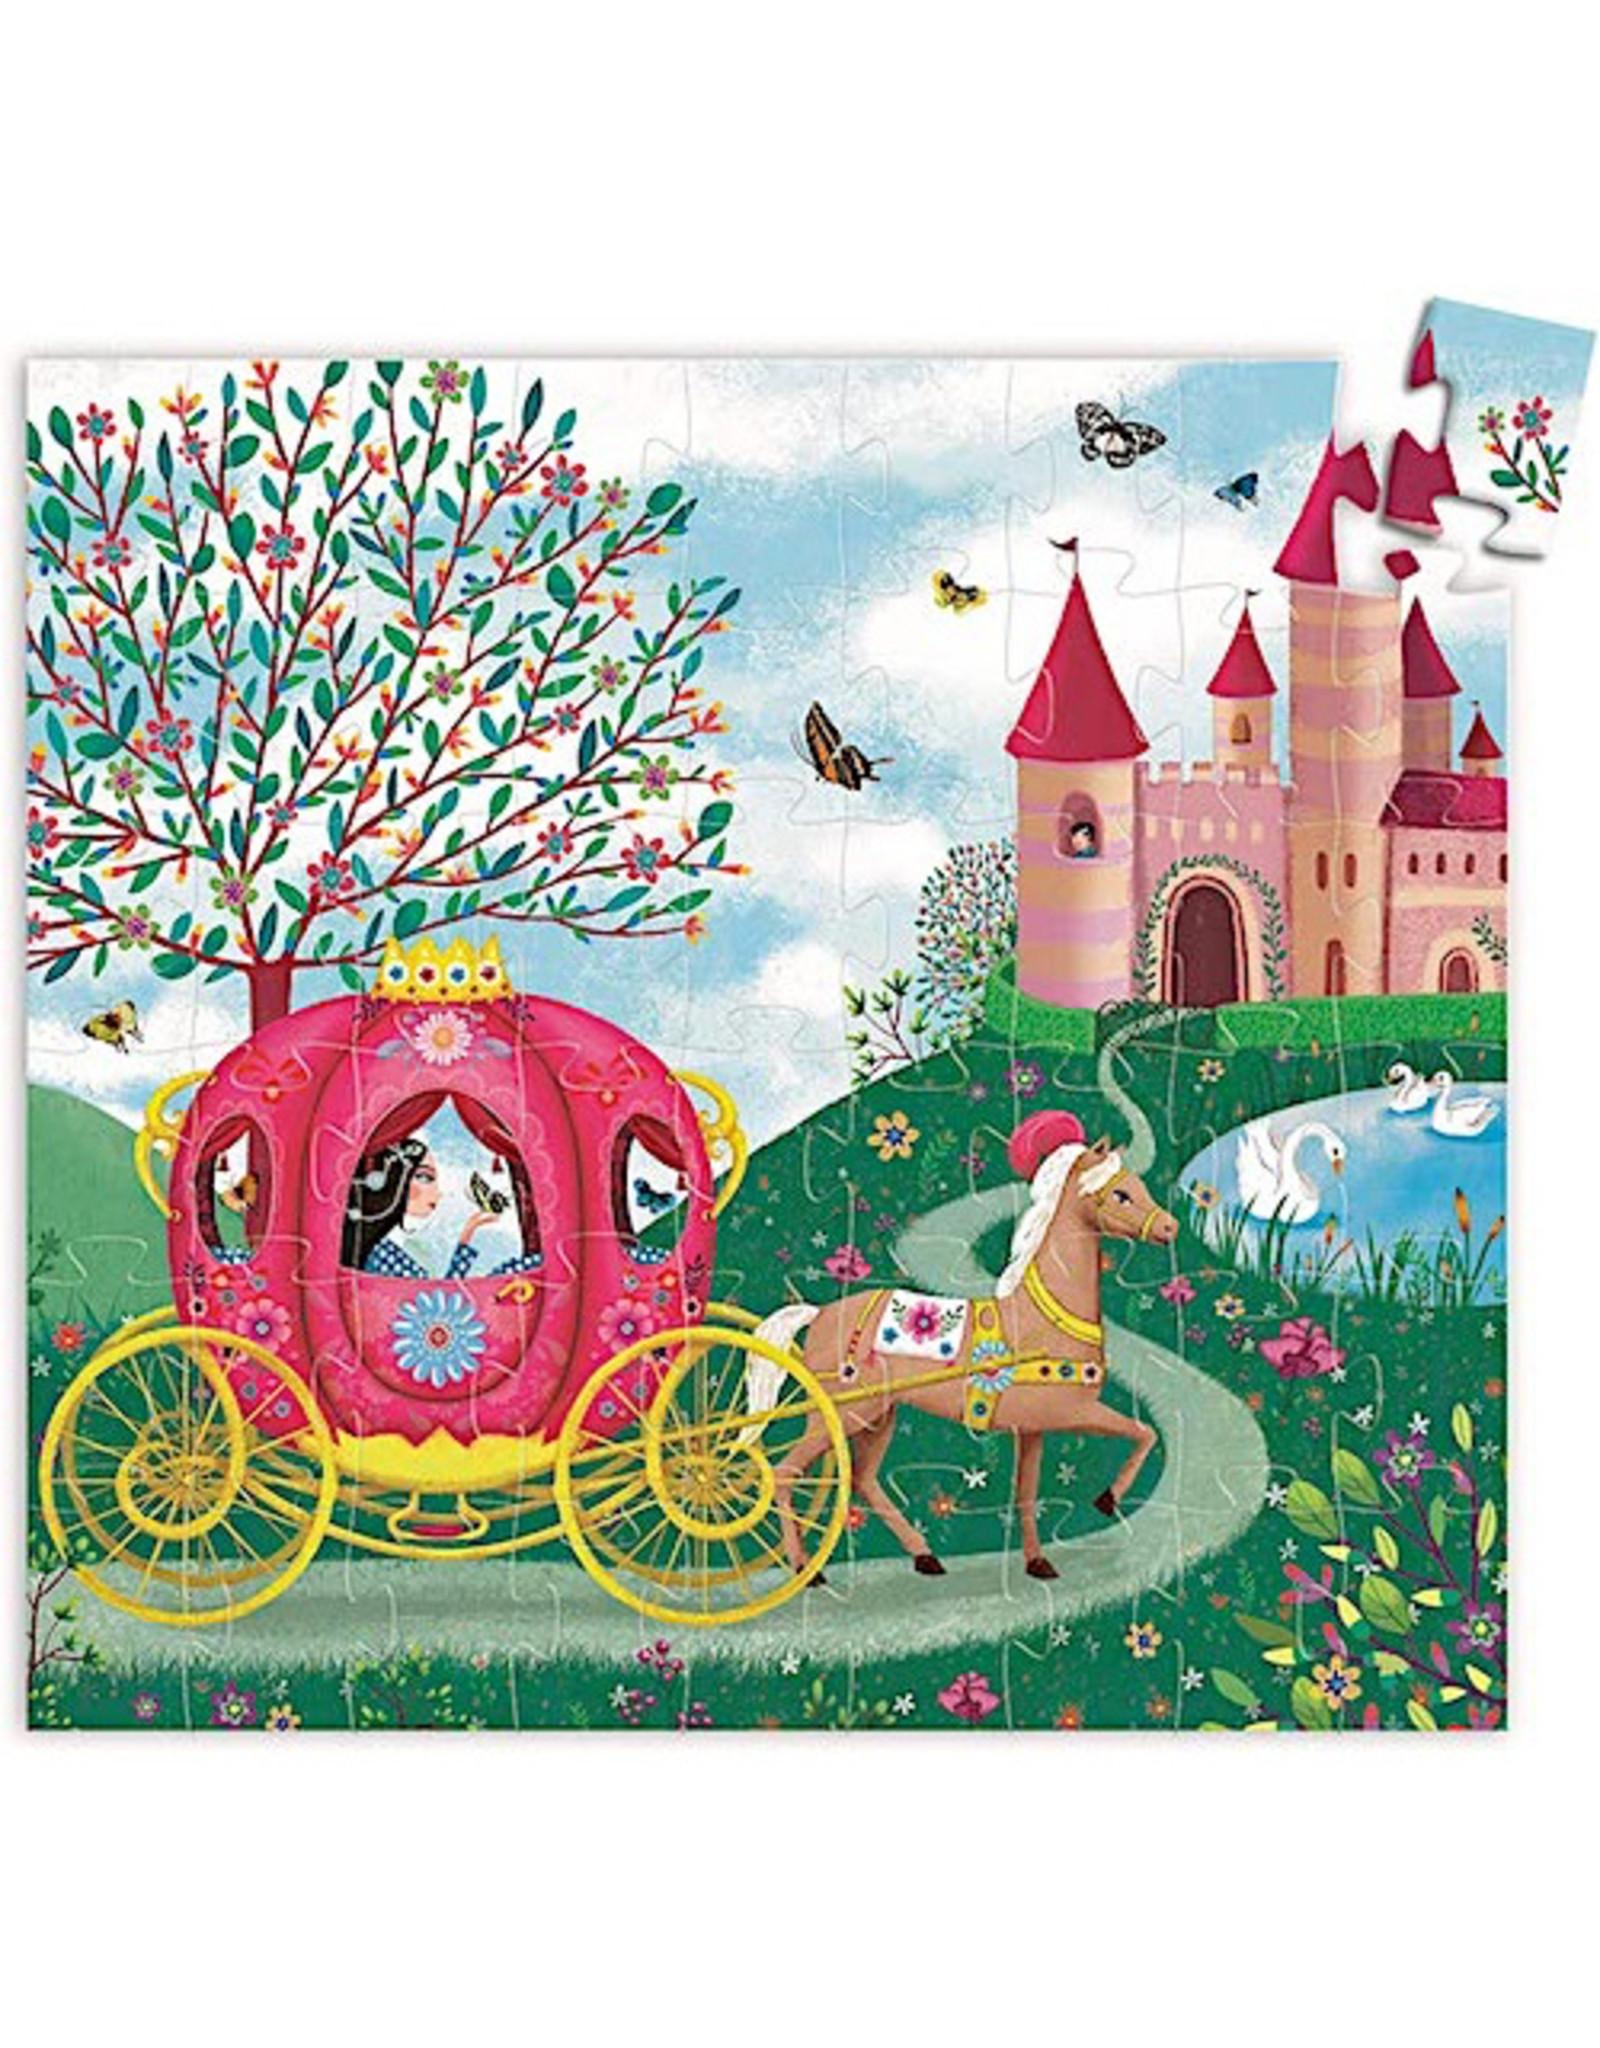 Djeco Silhouette Puzzles - Elise's Carriage - 54pcs